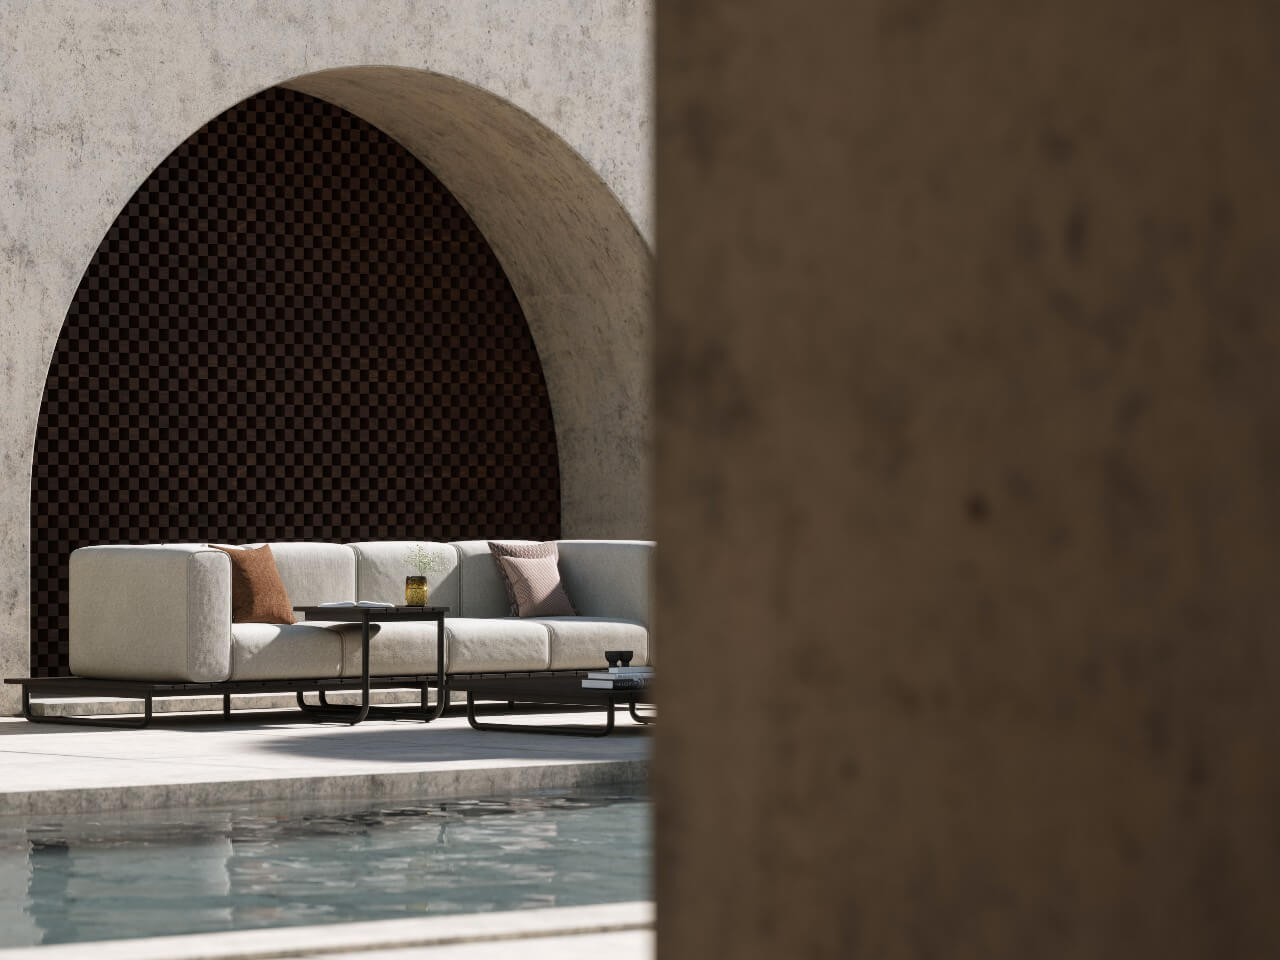 Outdoor-collection-domkapa-summer-interior-design-trends-8